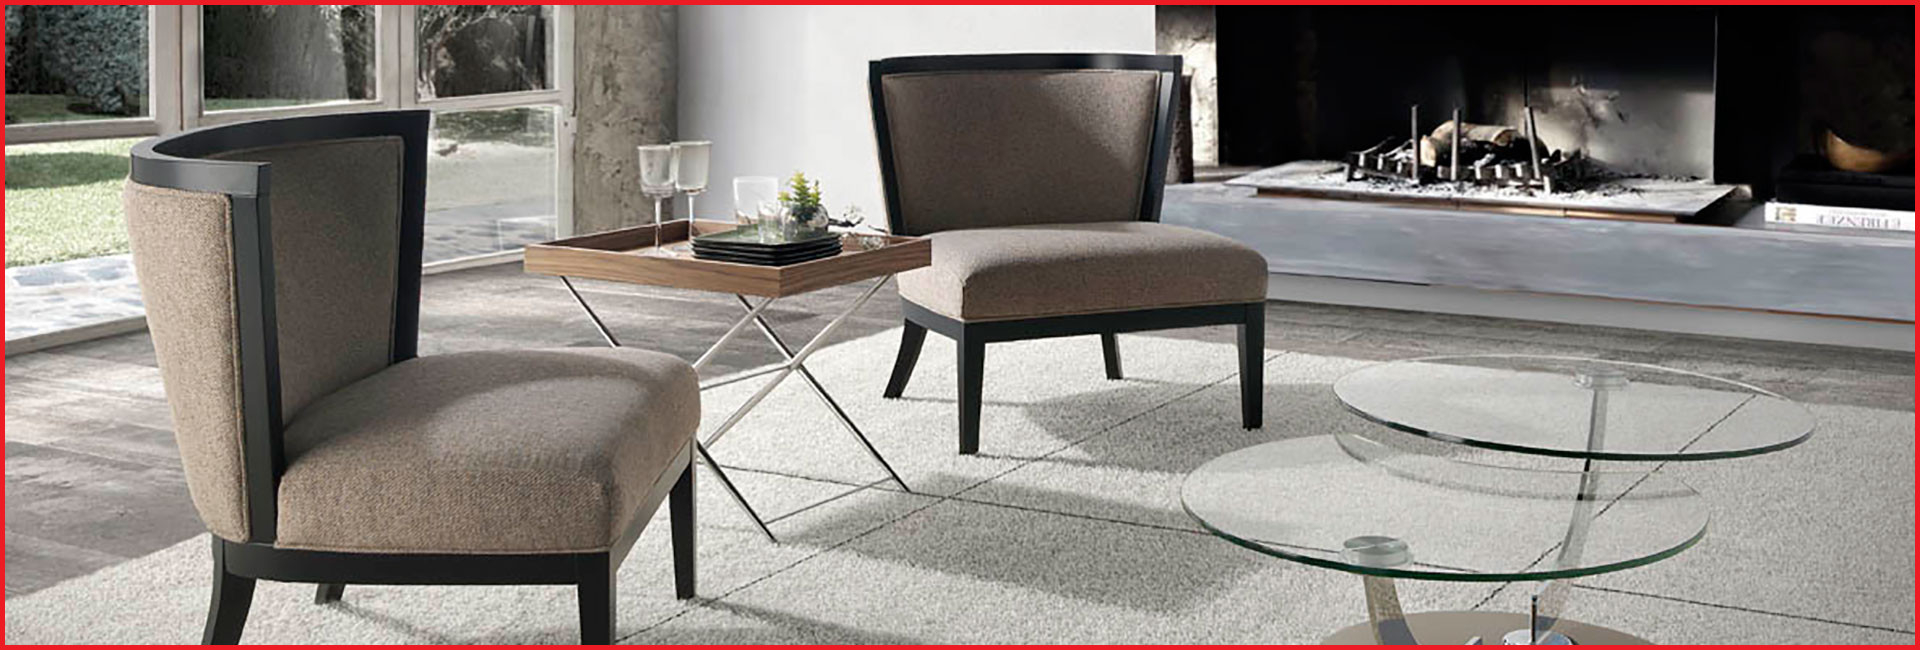 Muebles Huelva 87dx Tienda De Muebles Huelva Tienda De Muebles Huelva Great Ertas